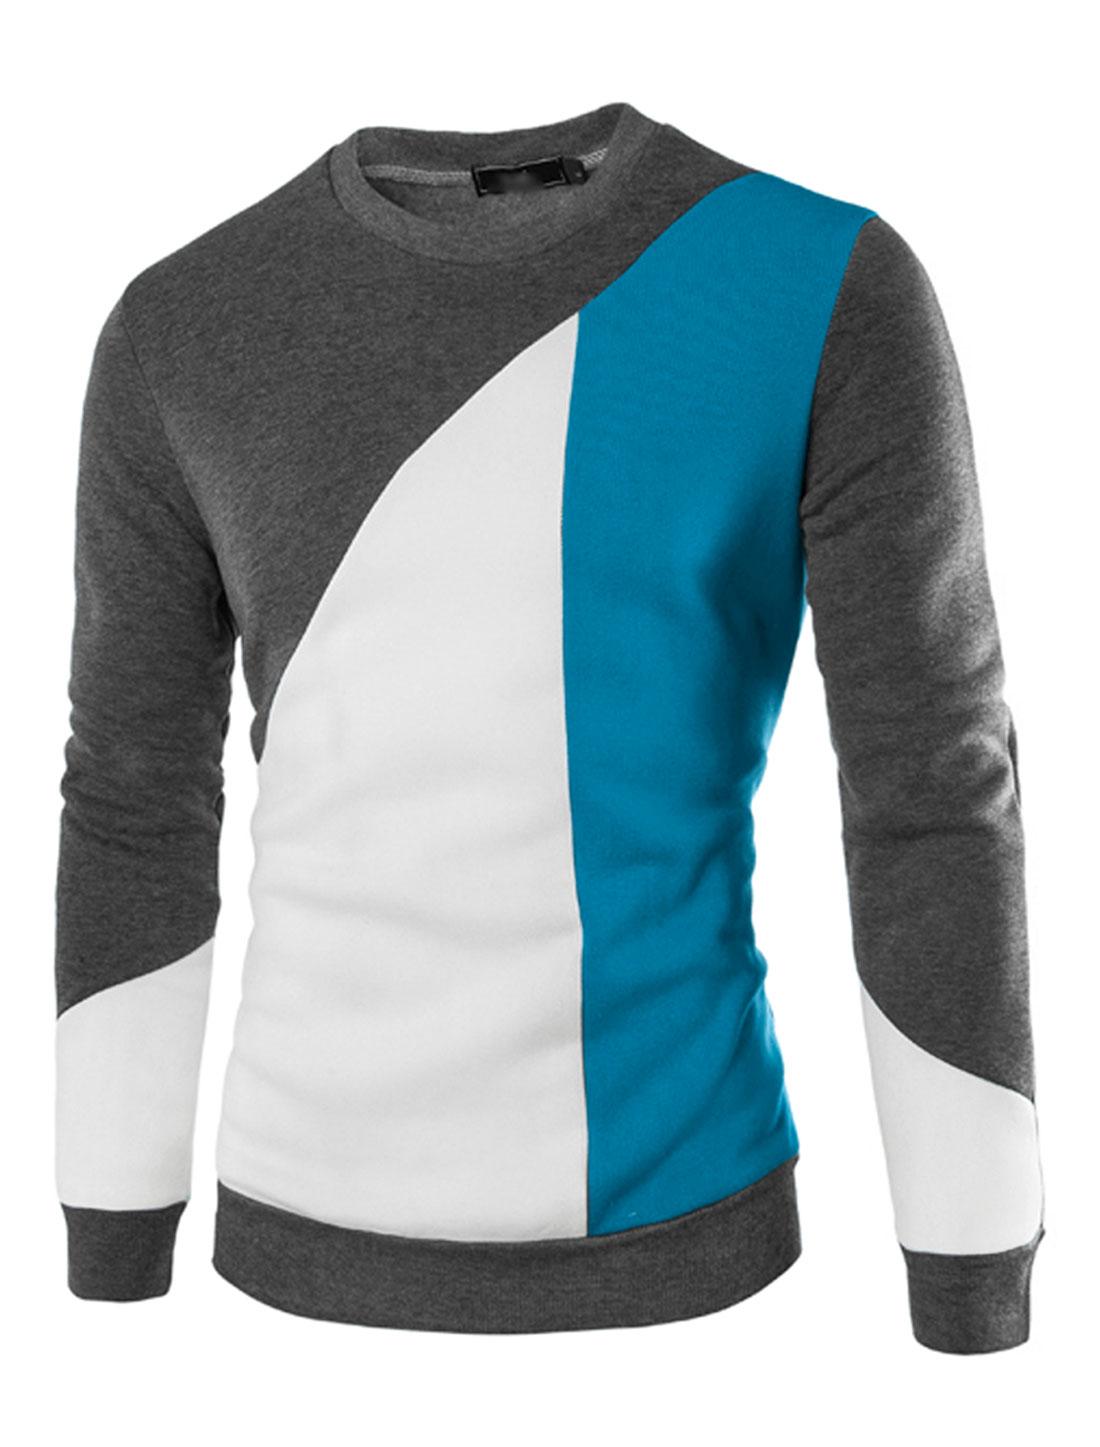 Men Color Block Soft Lined Long Sleeves Crew Neck Sweatshirt Dark Gray M